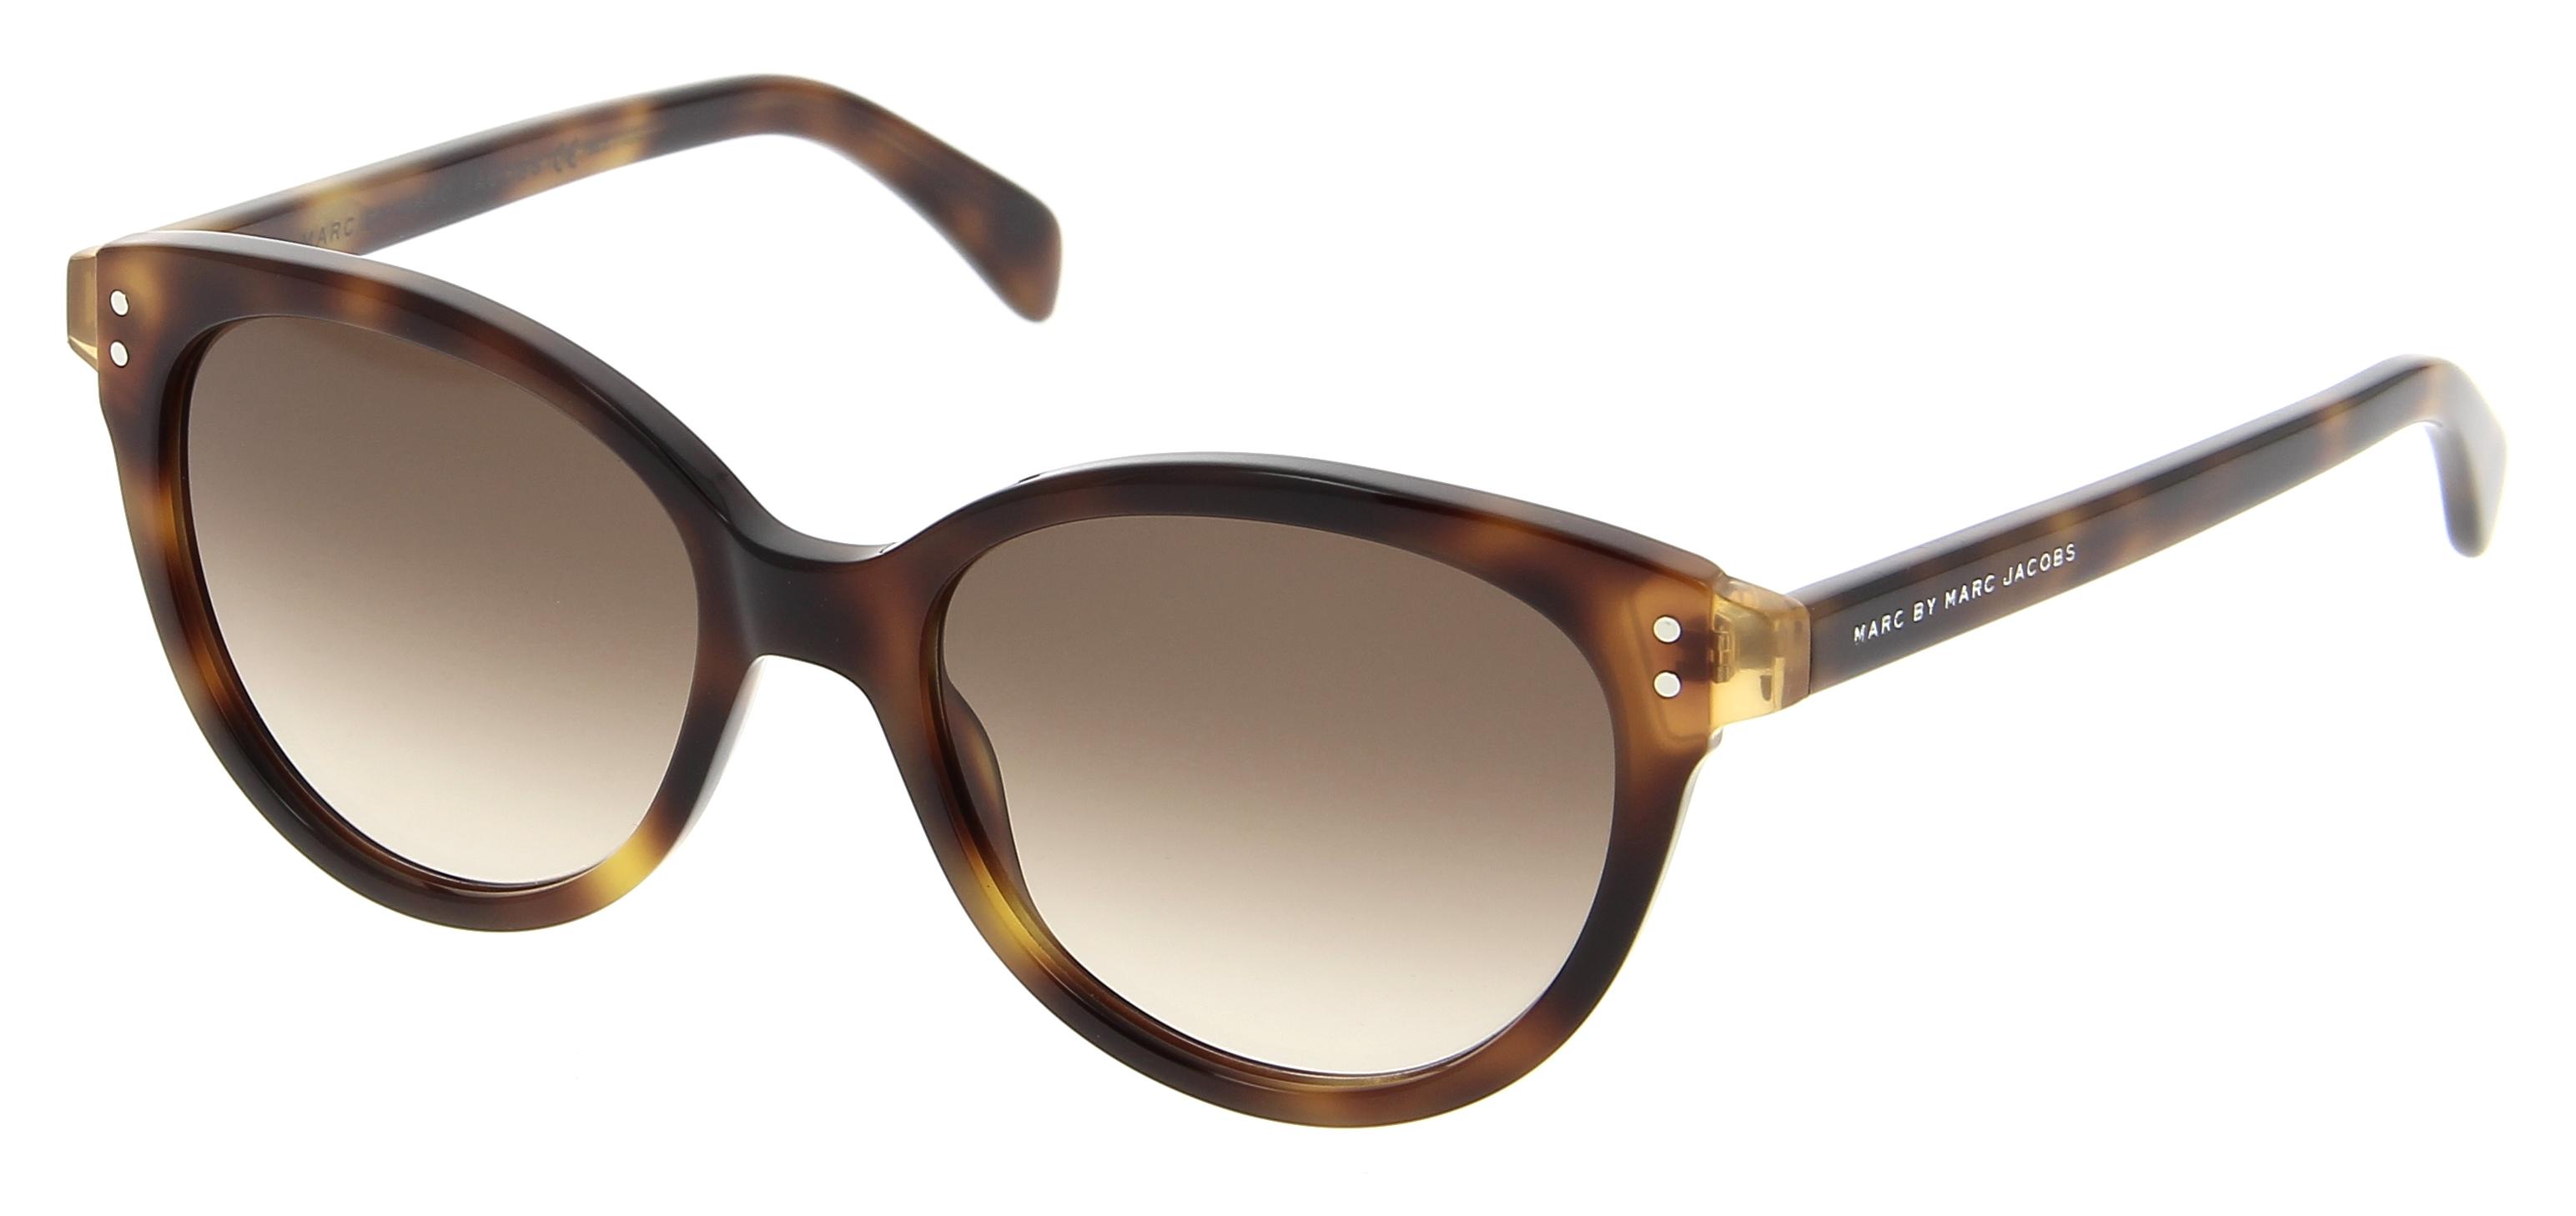 lunettes de soleil marc jacobs femme. Black Bedroom Furniture Sets. Home Design Ideas